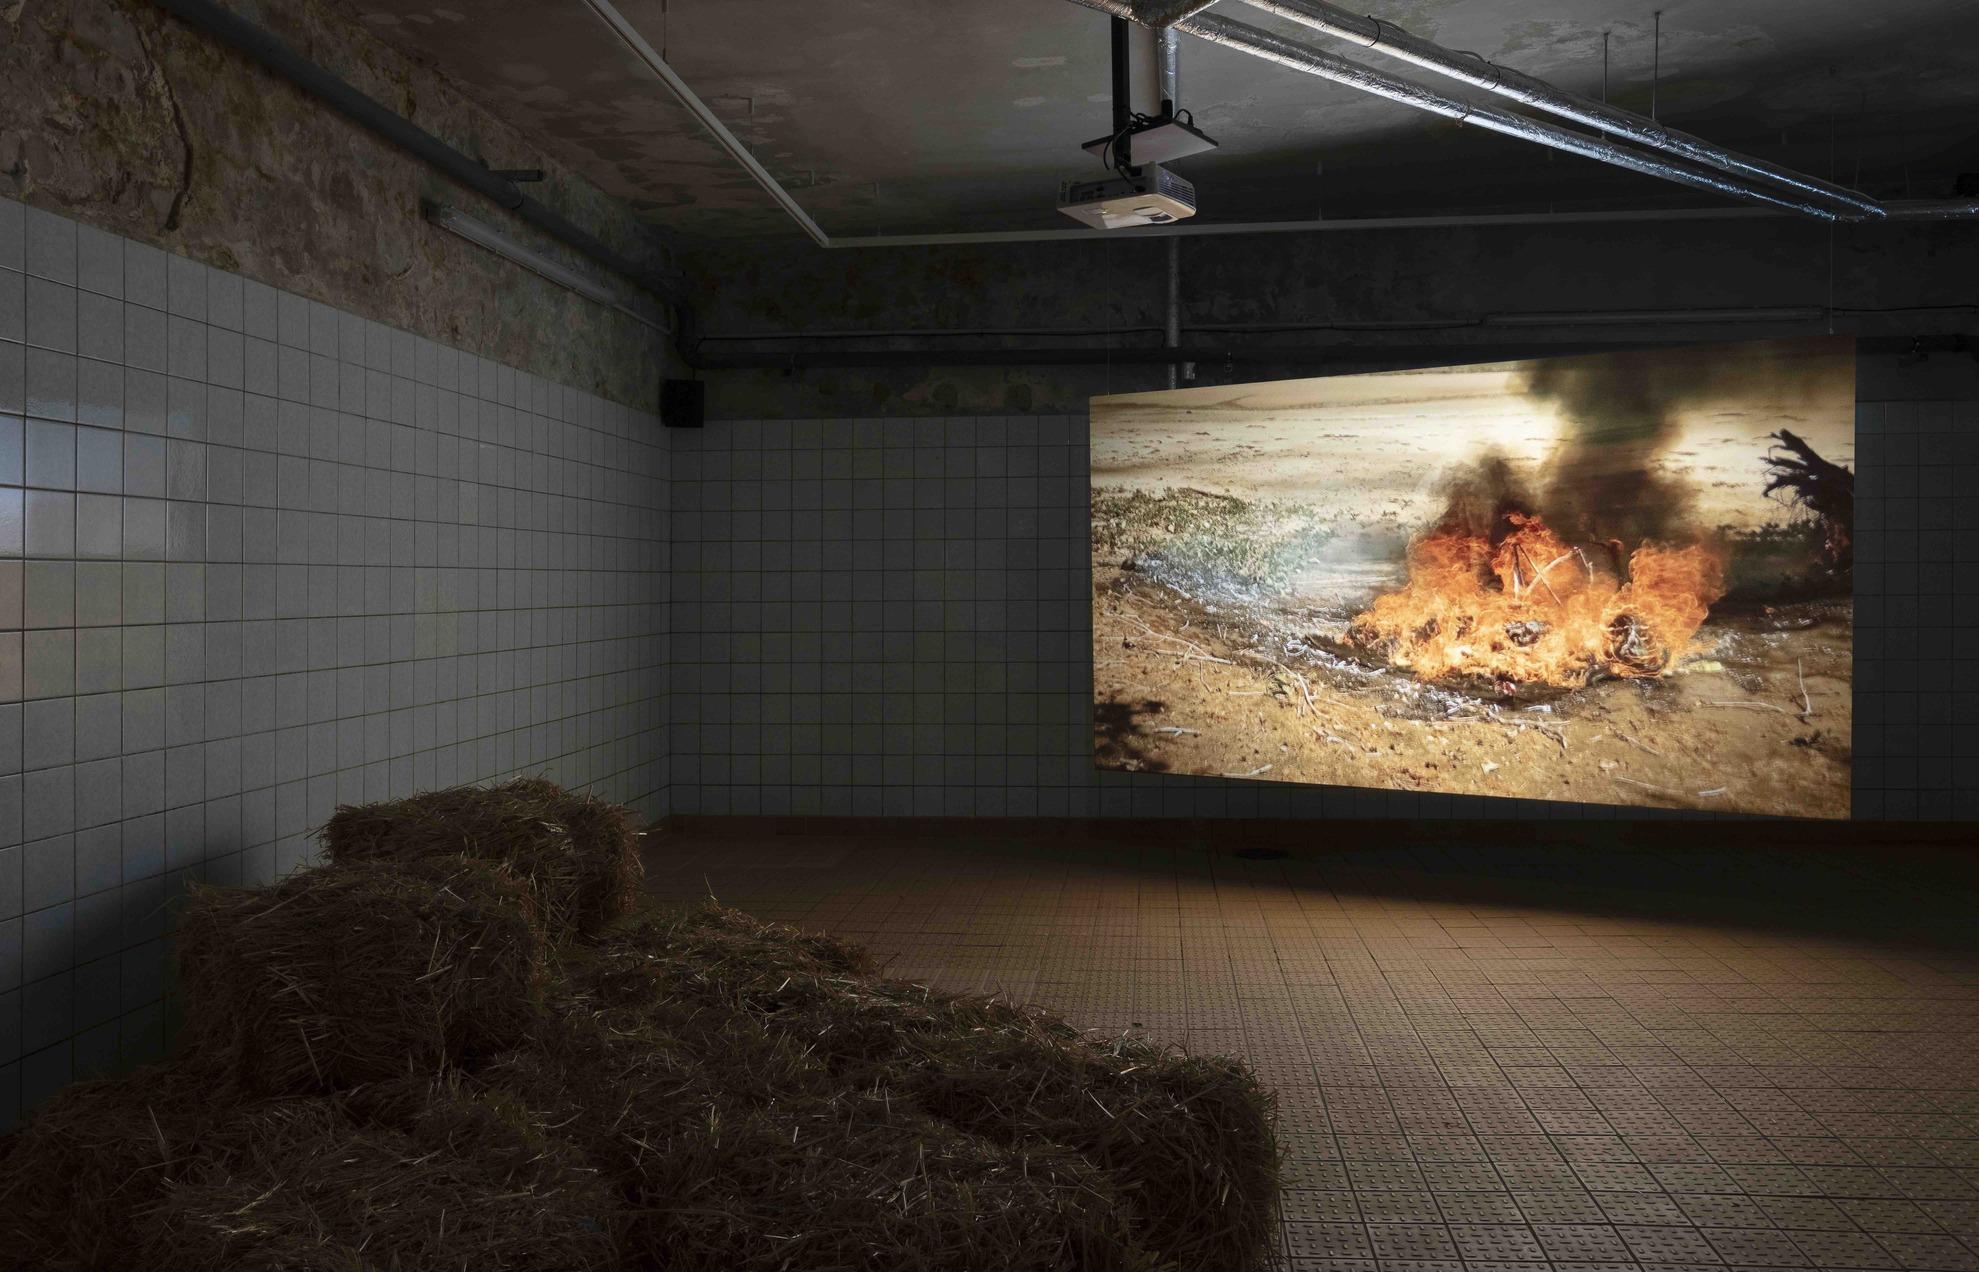 Karrabing Film Collective, Mermaids, or Aiden in Wonderland, 2019, Video, colour (27 minutes)